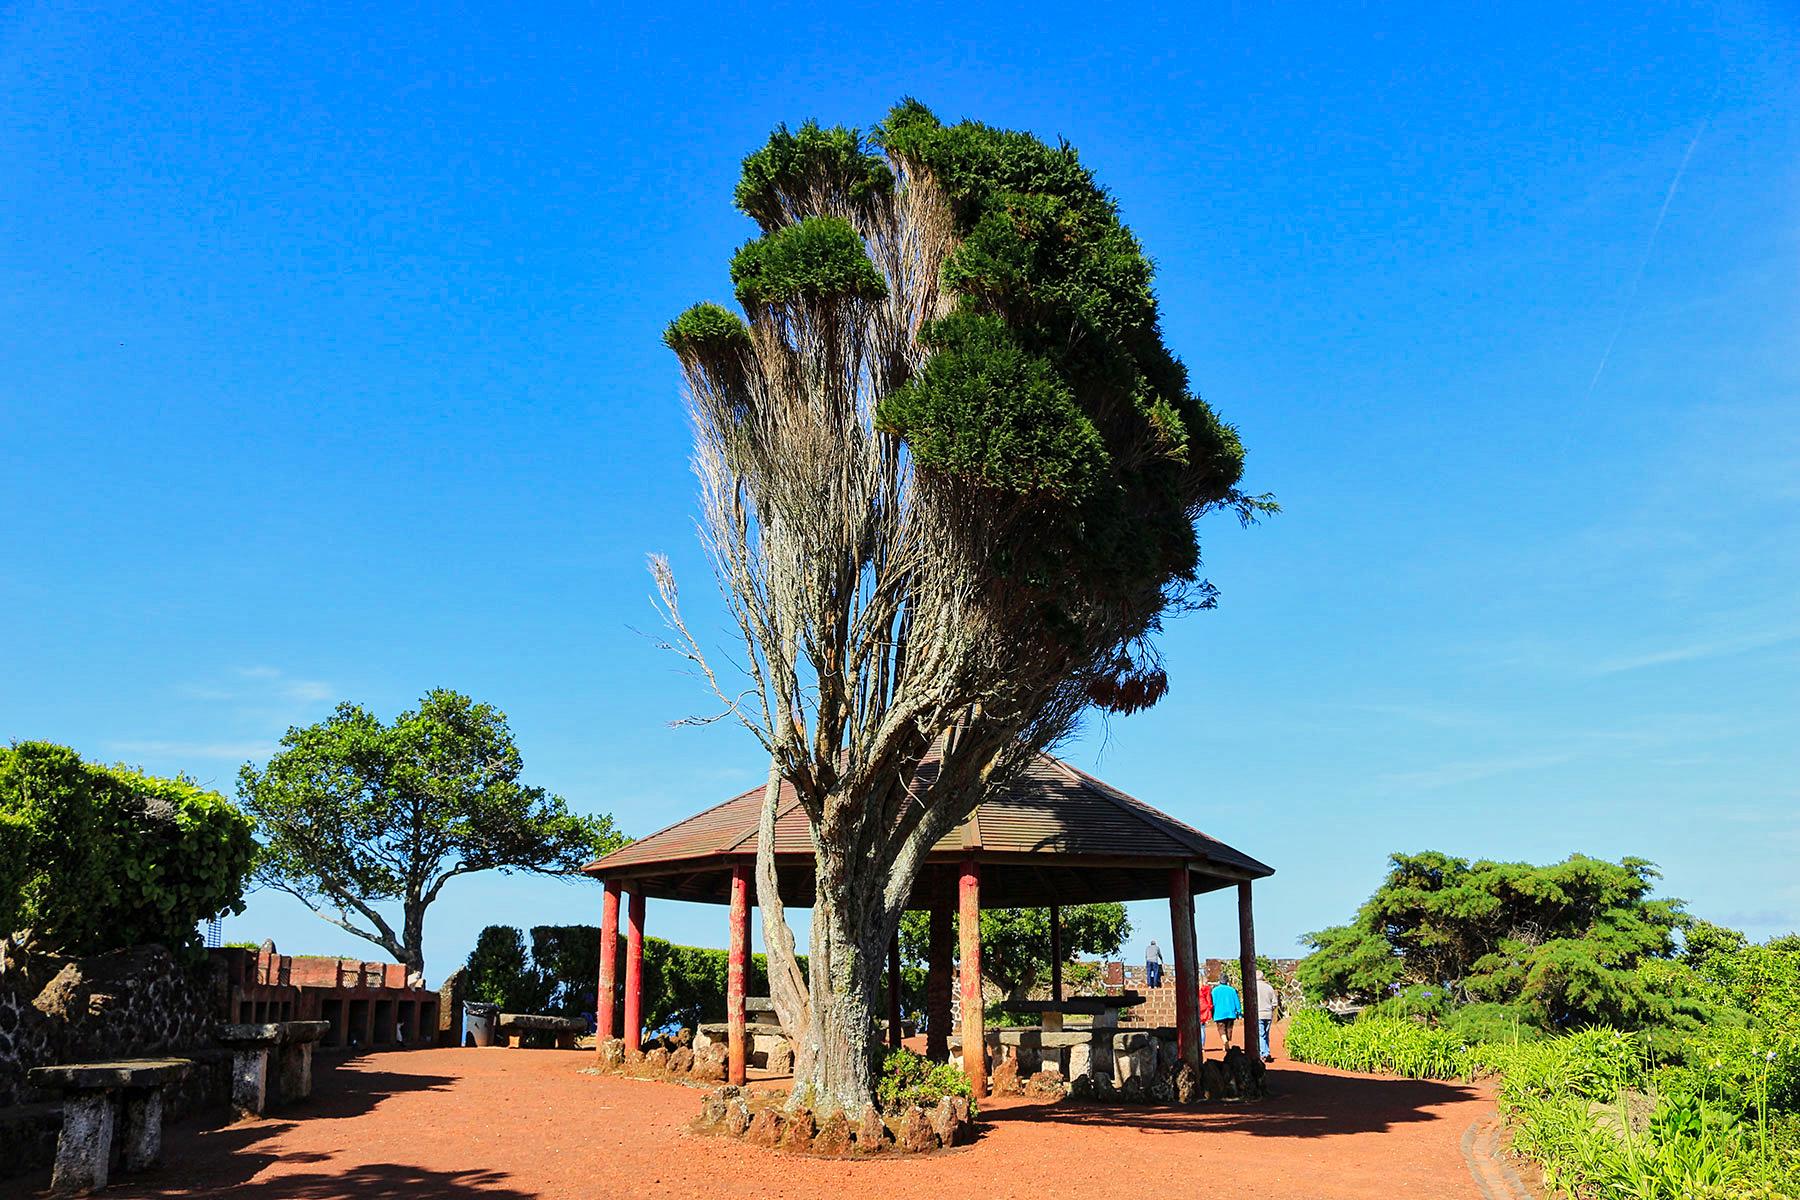 Miradouro da Ponta da Madrugada – Jardim – Nordeste